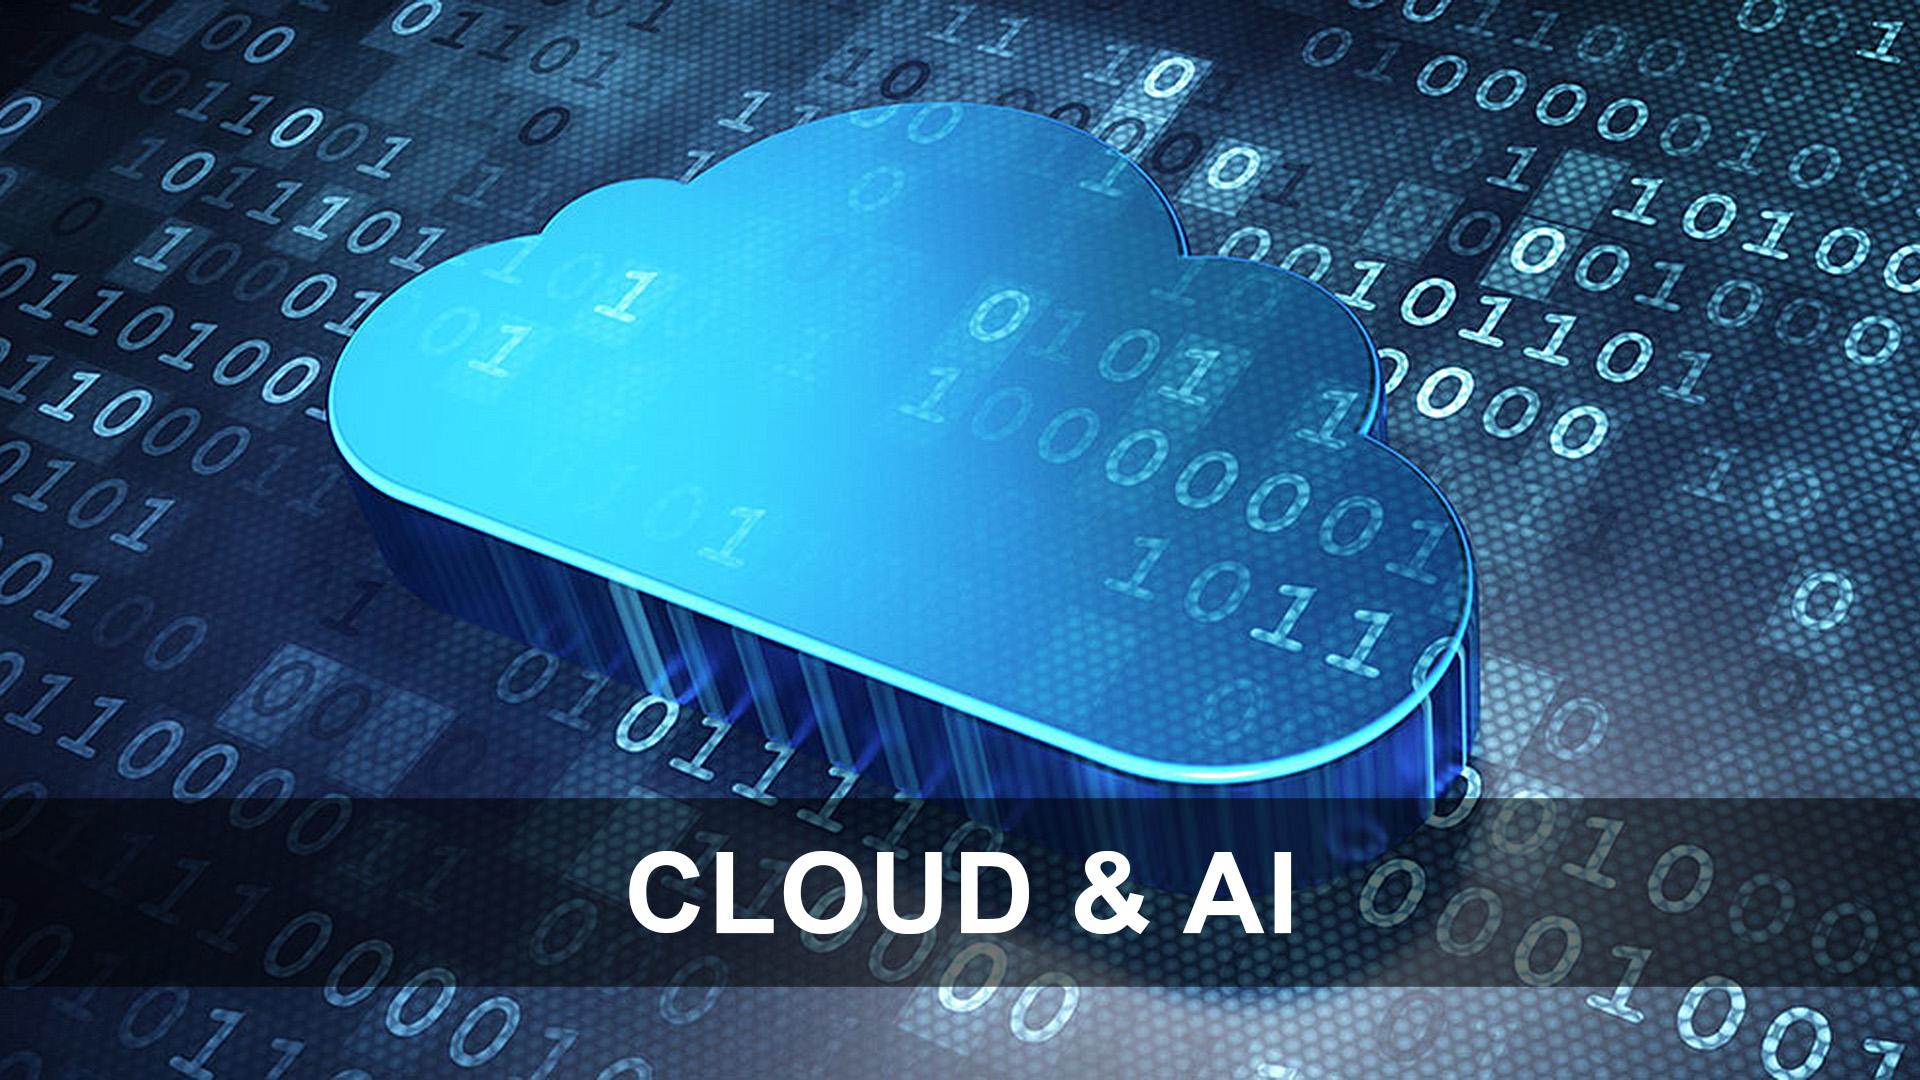 Cloud and AI Icon.jpg